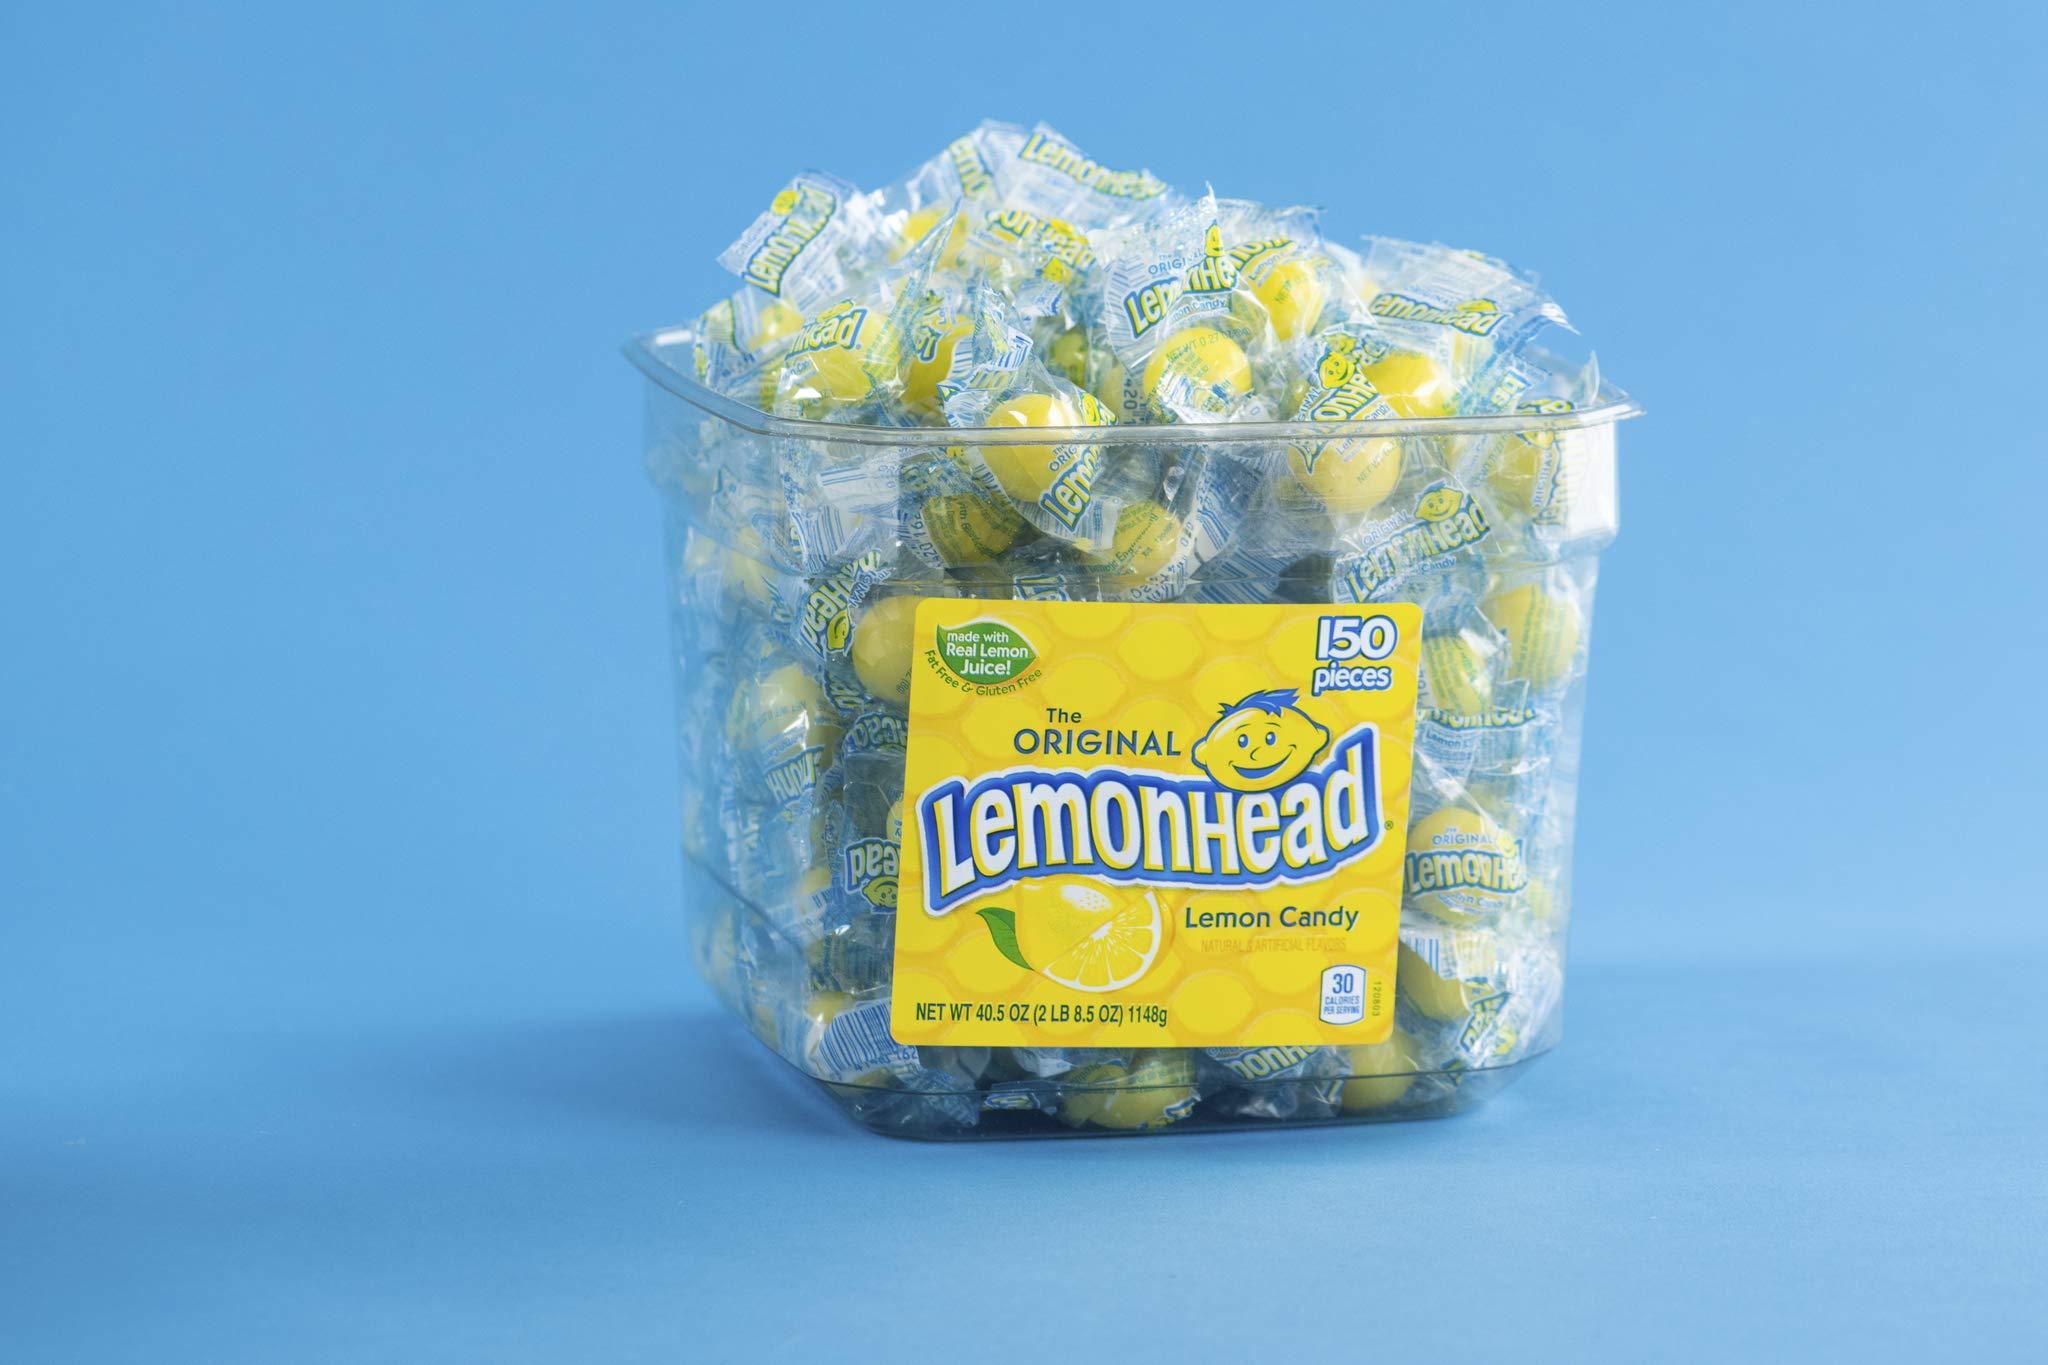 Lemonhead Lemon Candy, 150 Count Tub by LEMONHEADS